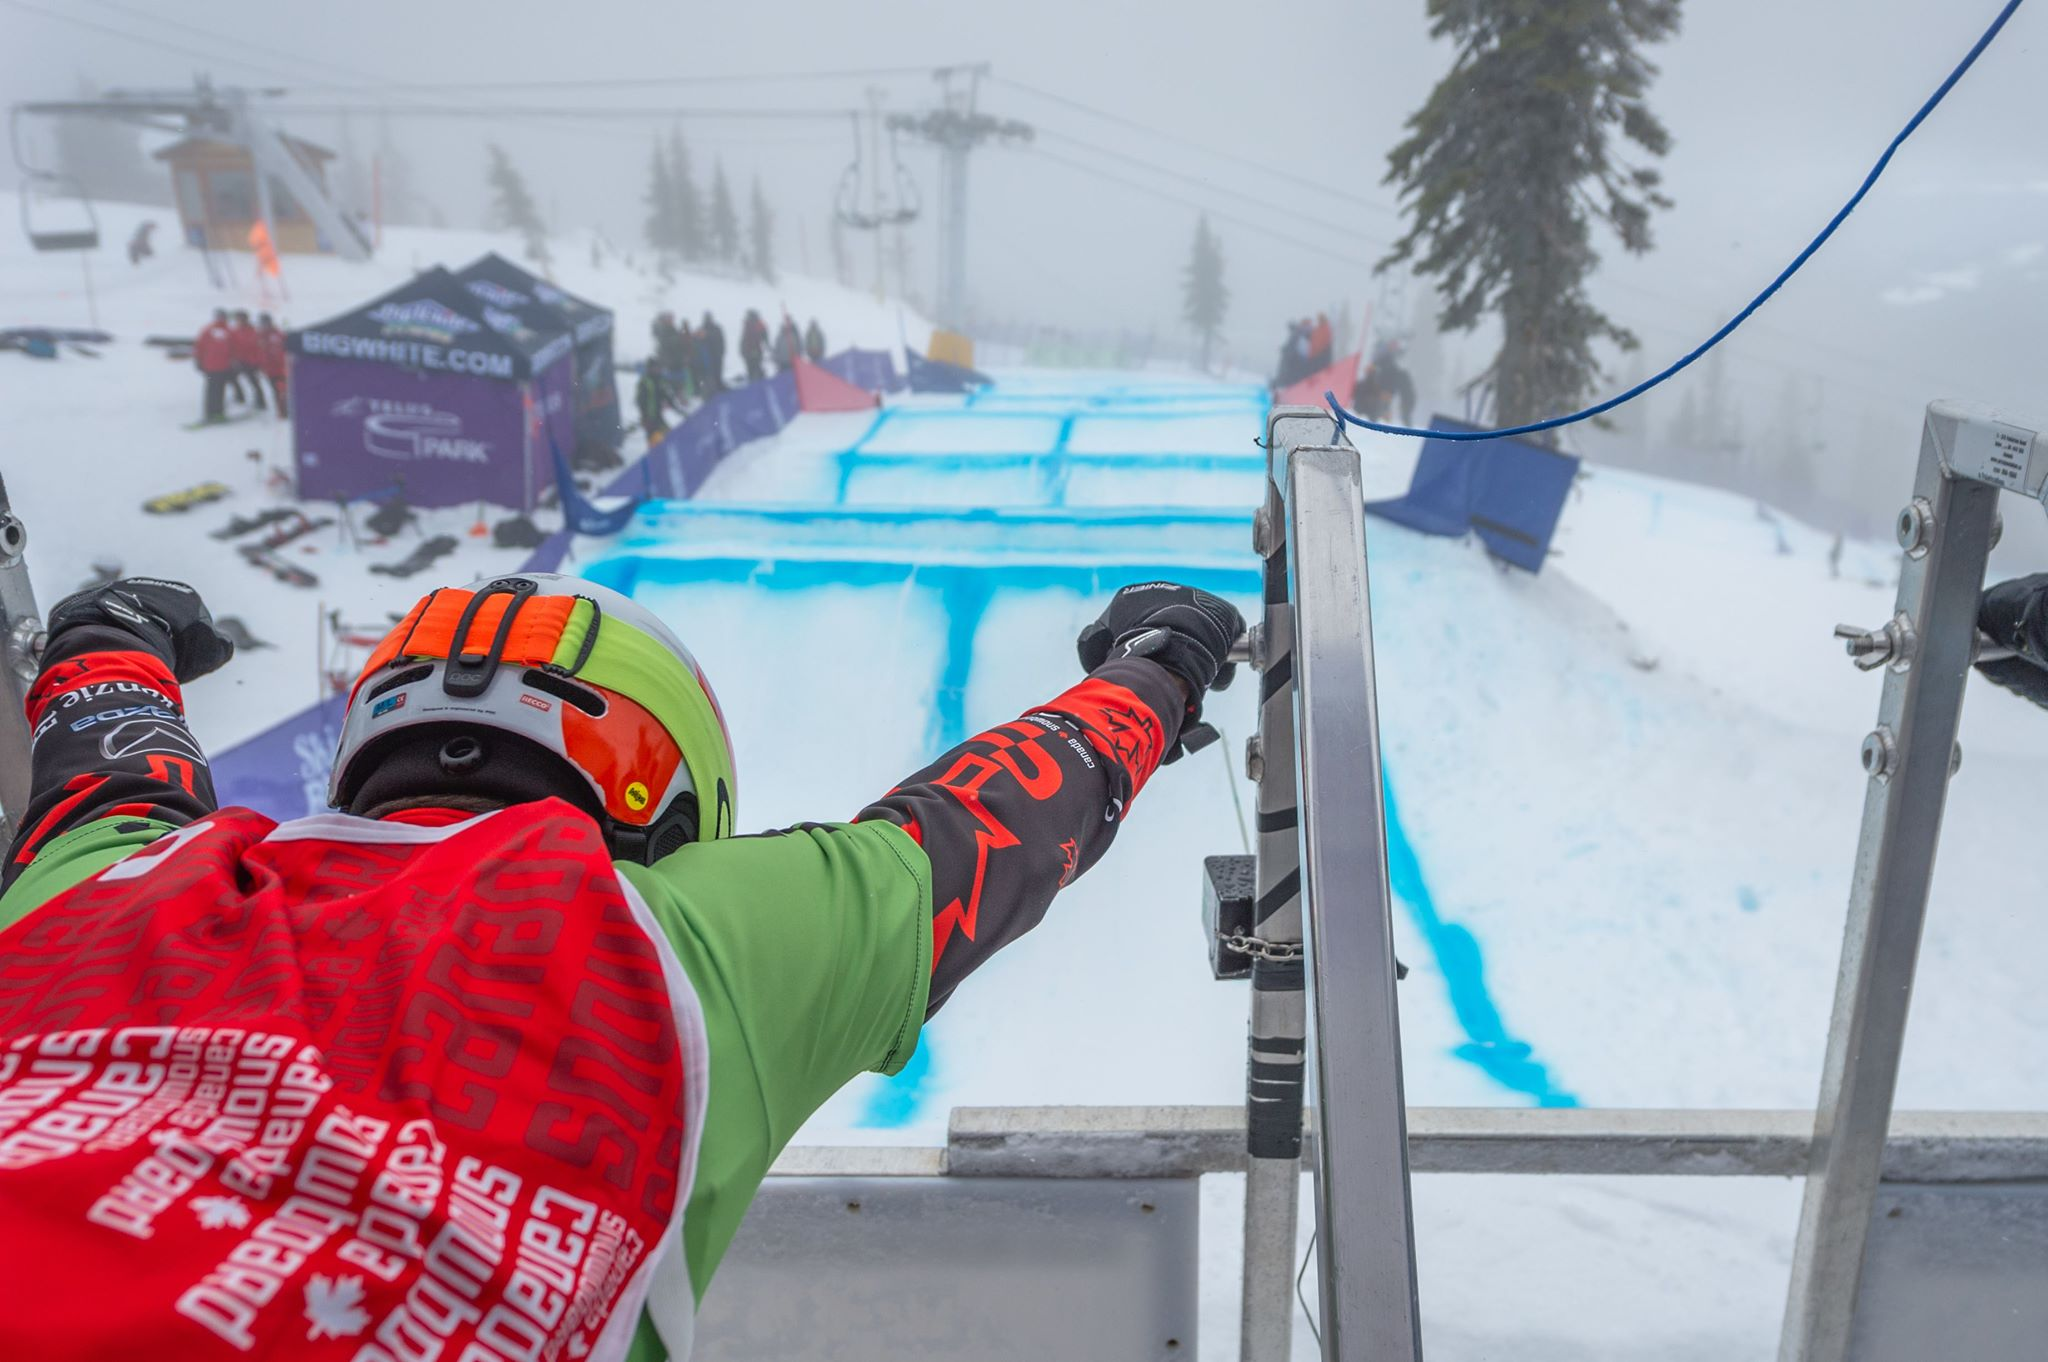 L'ESPRIT SPORTIF TVA – Snowboardcross: Eliot Grondin- Golf: Escapade en Beauce